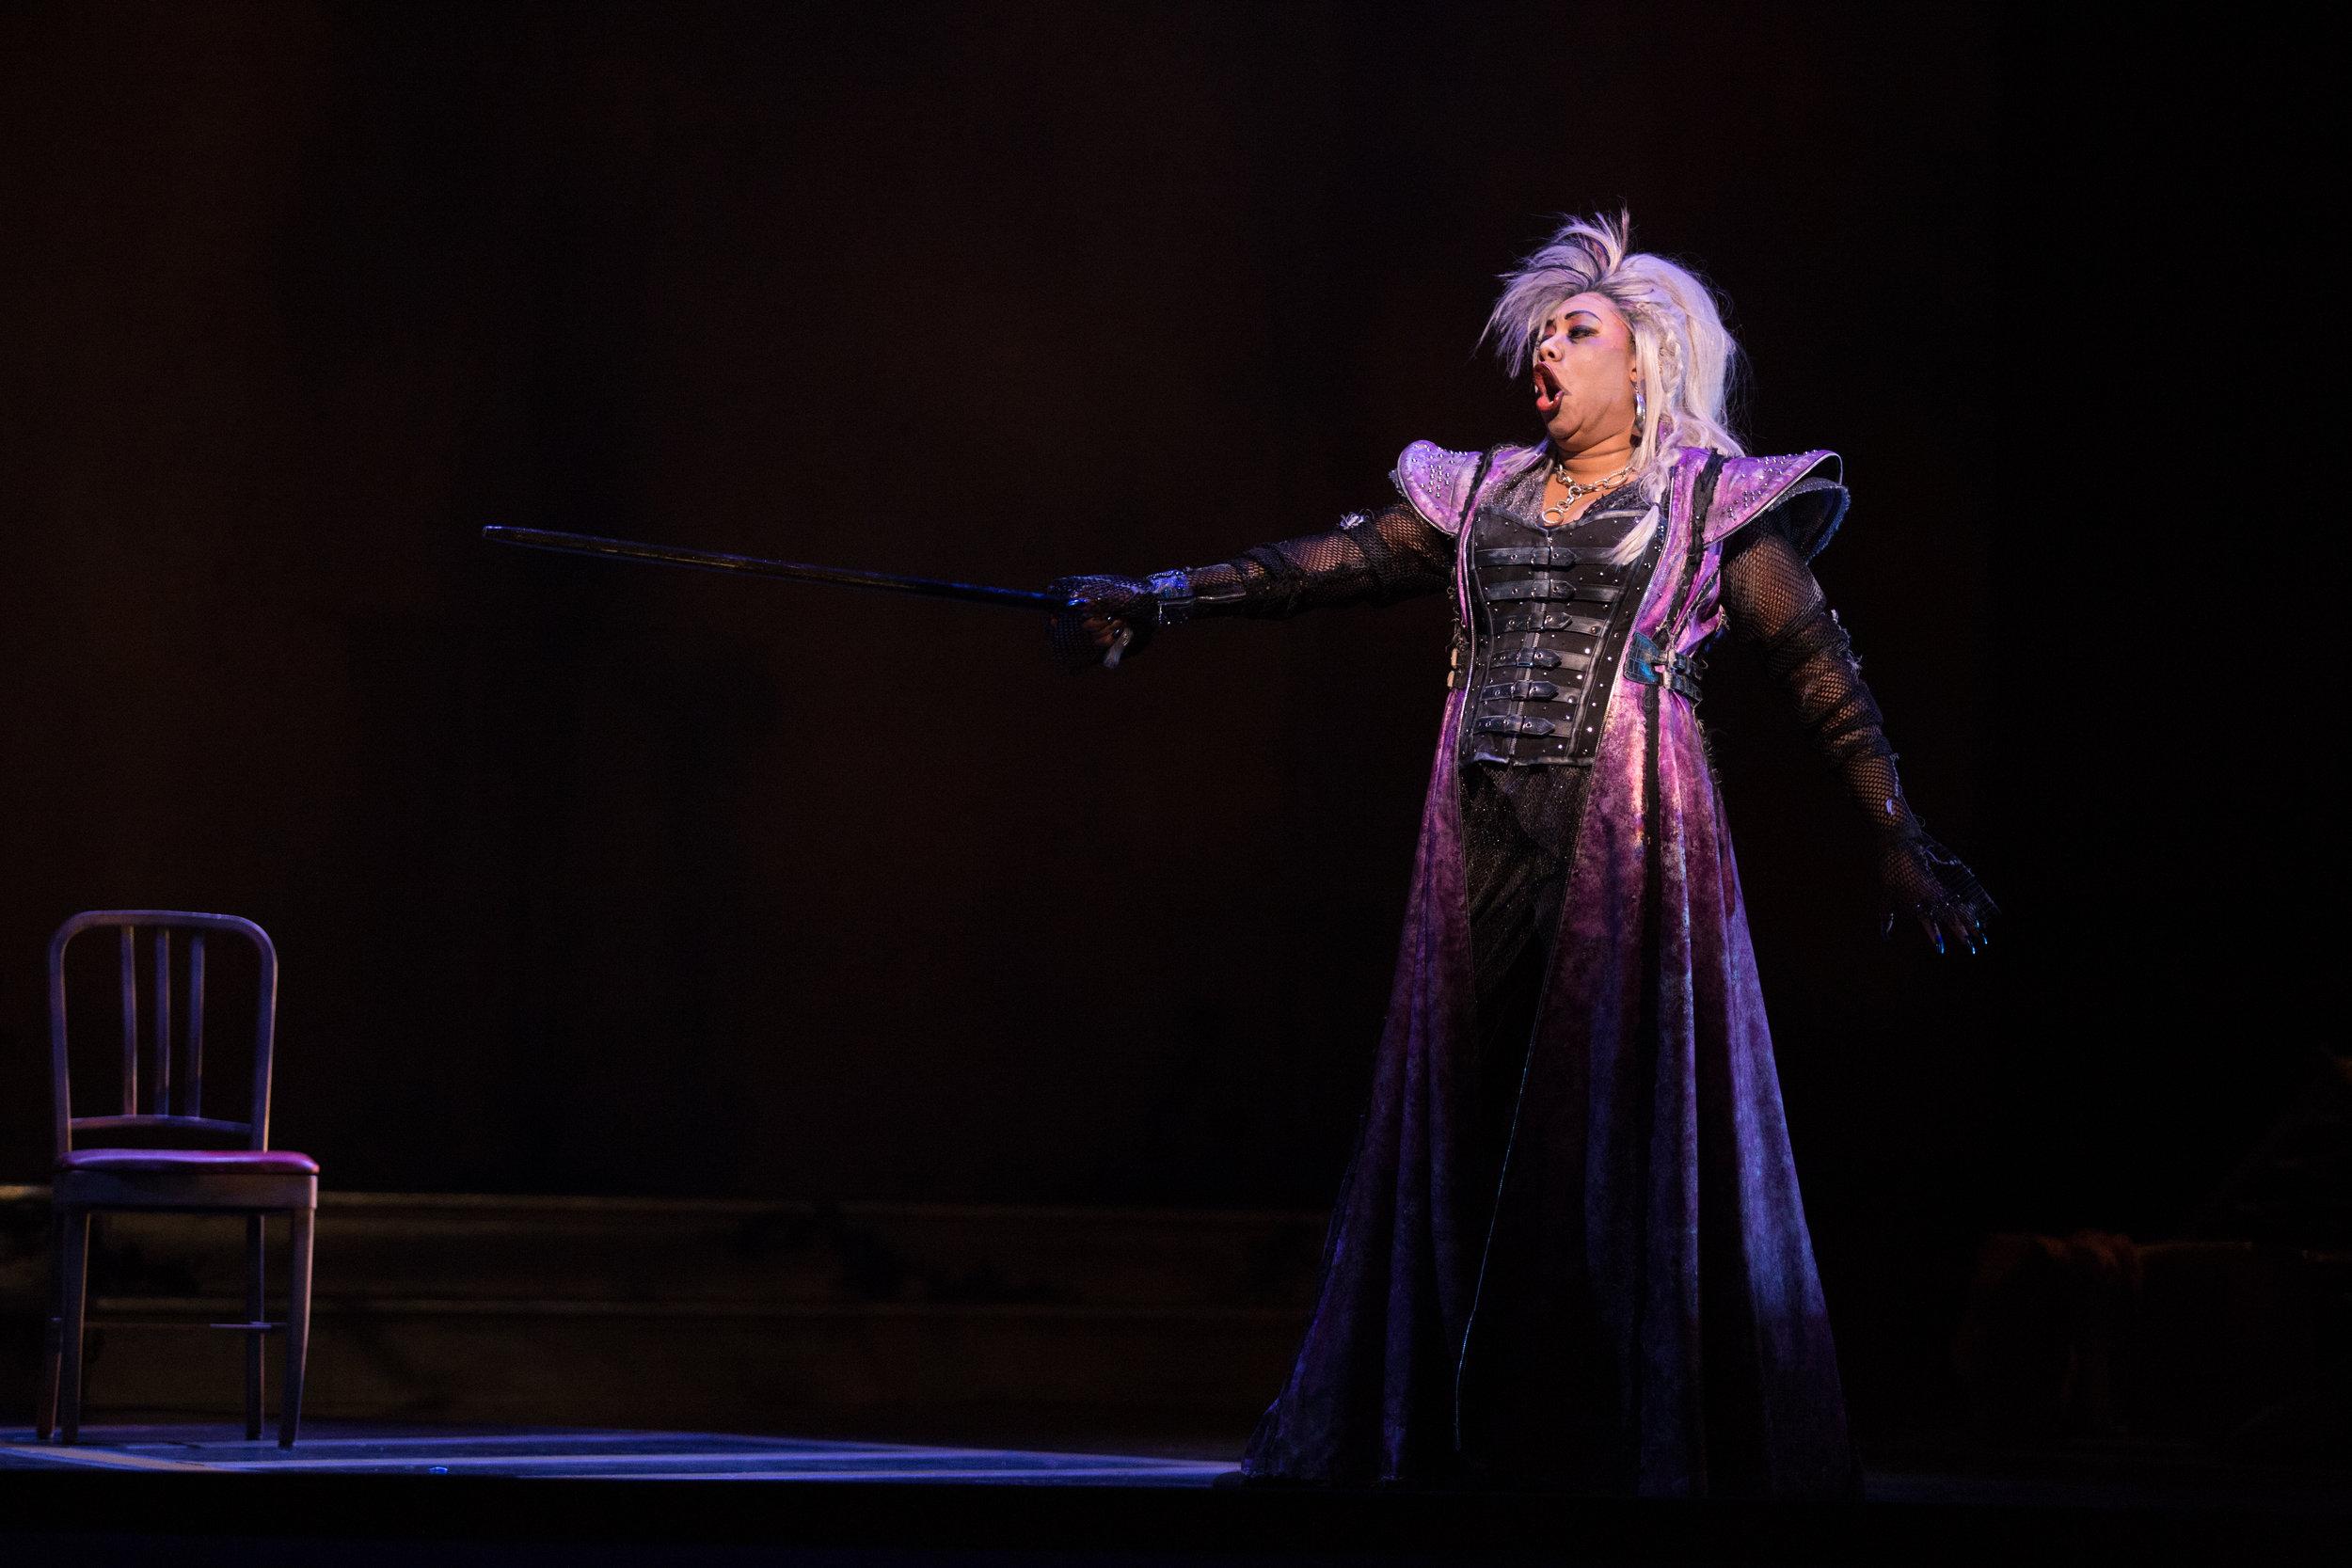 Catherine in Opéra de Montréal's production of Elektra